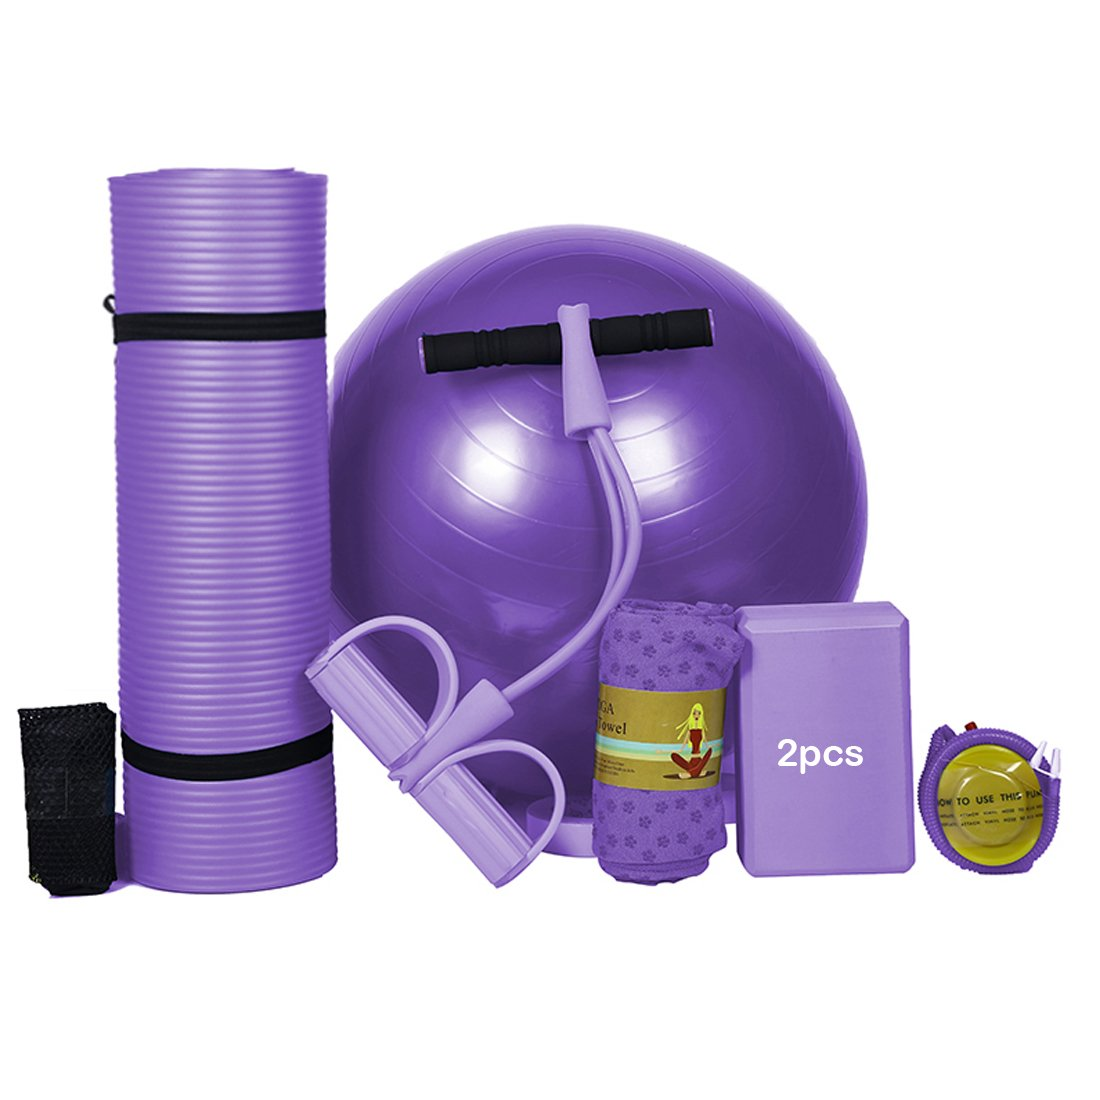 AWADUO Yoga 6-Pcs Set For Starter - Yoga Exercise Mat, Yoga Mat Towel, Yoga Fitness Ball, 2 Yoga Blocks, Yoga Pull Rope, Accessorized With Inflator